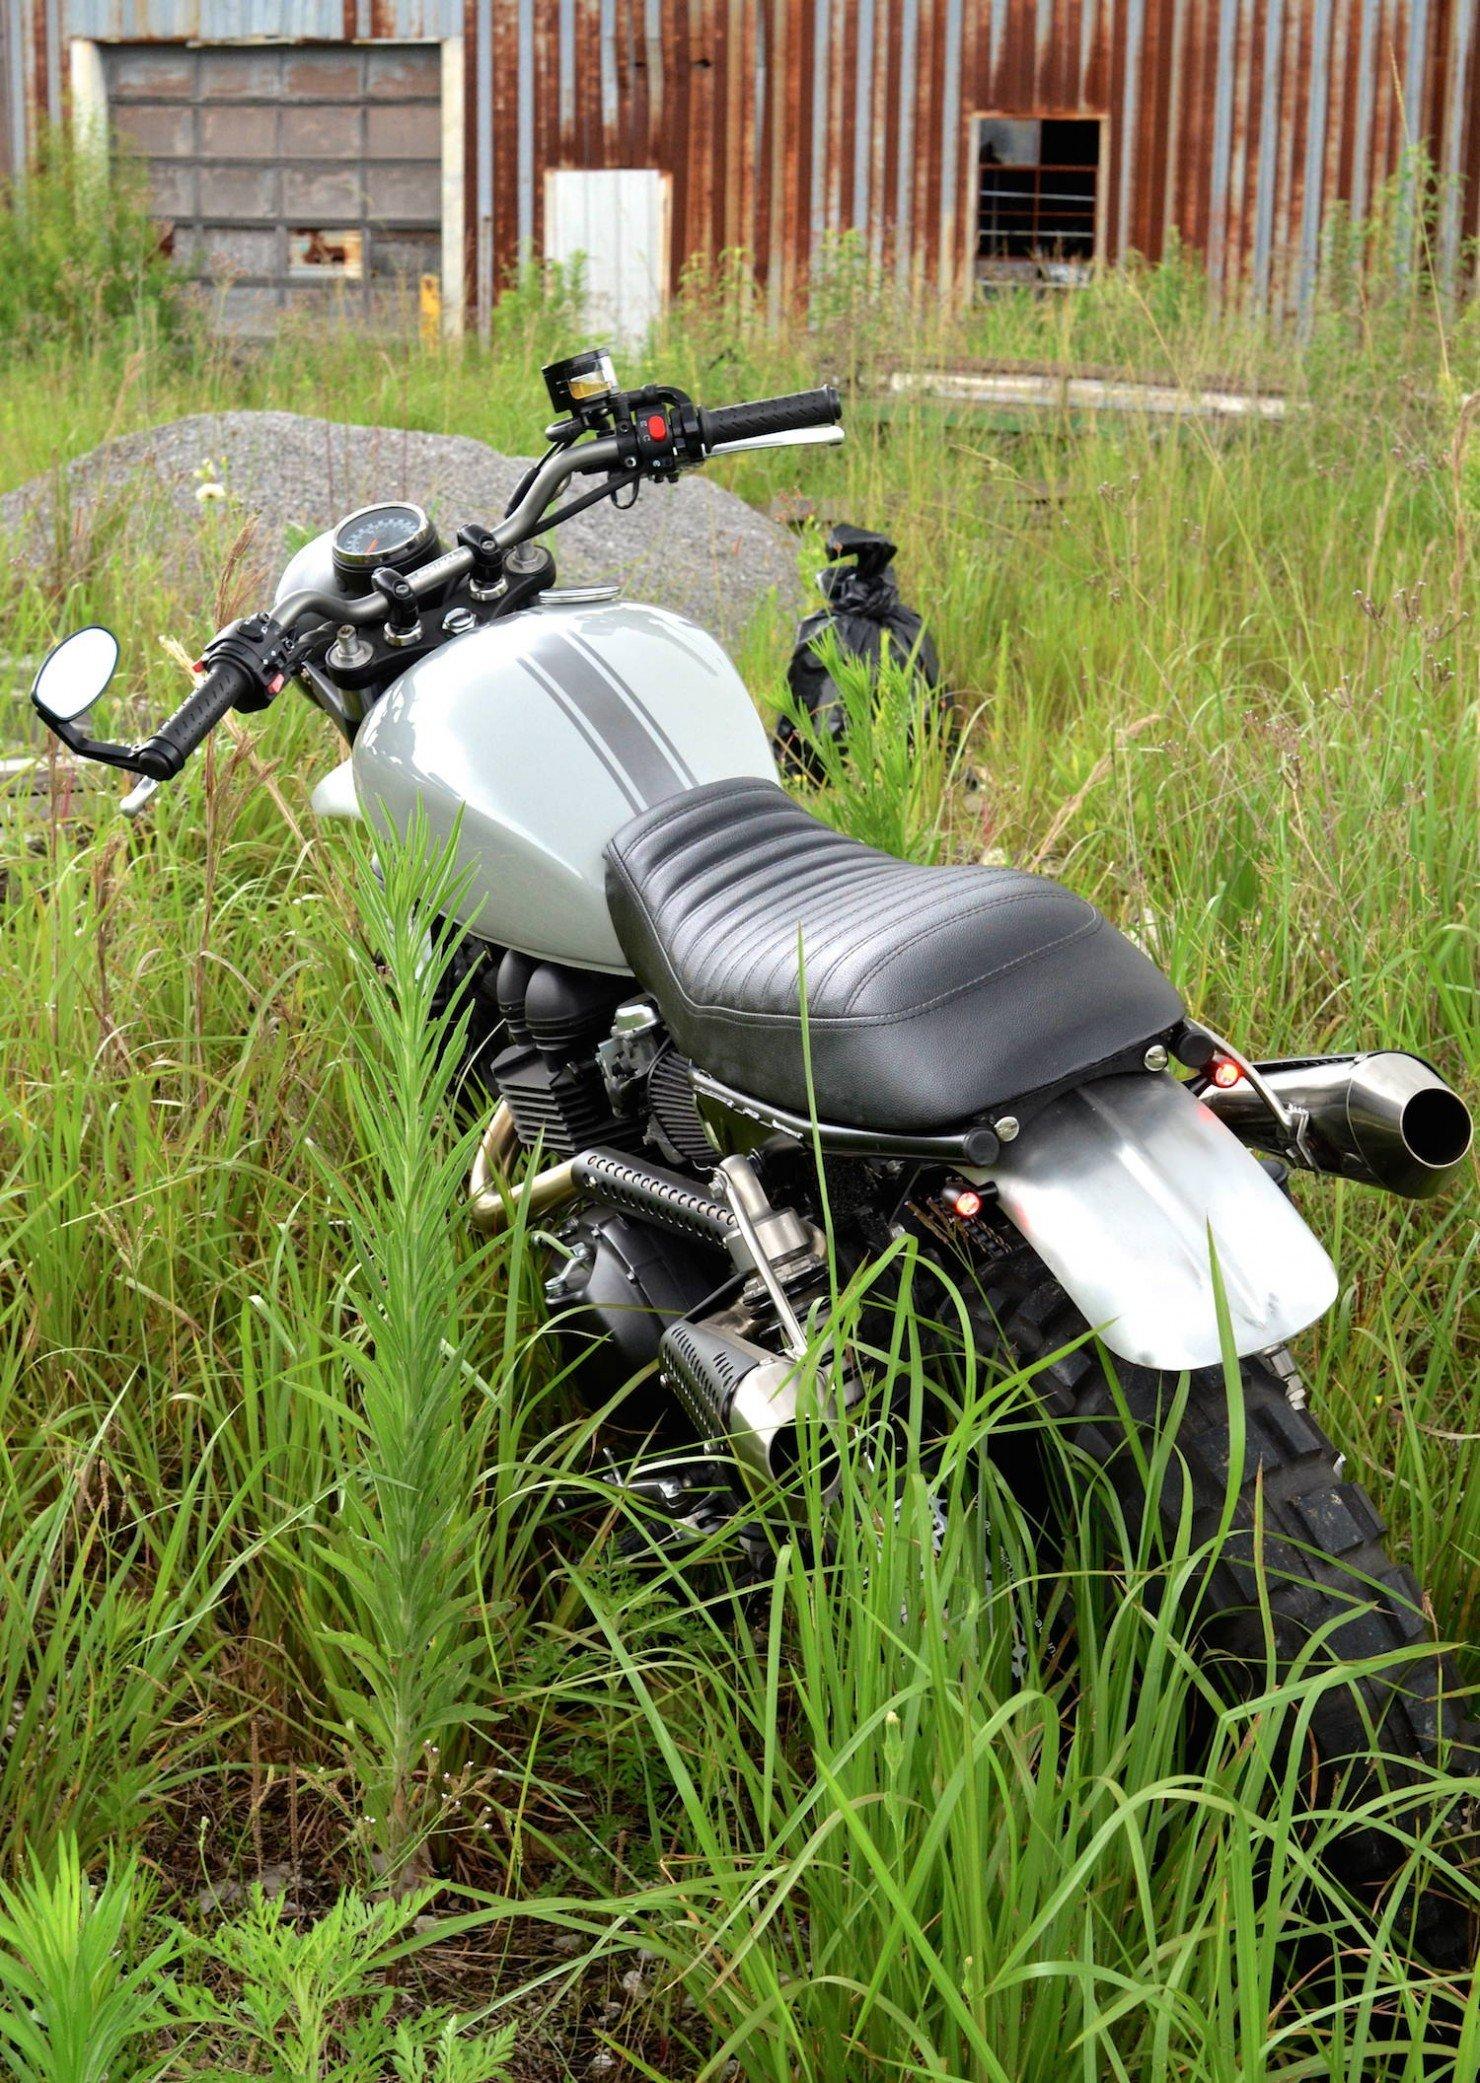 Triumph Scrambler Motorcycle 6